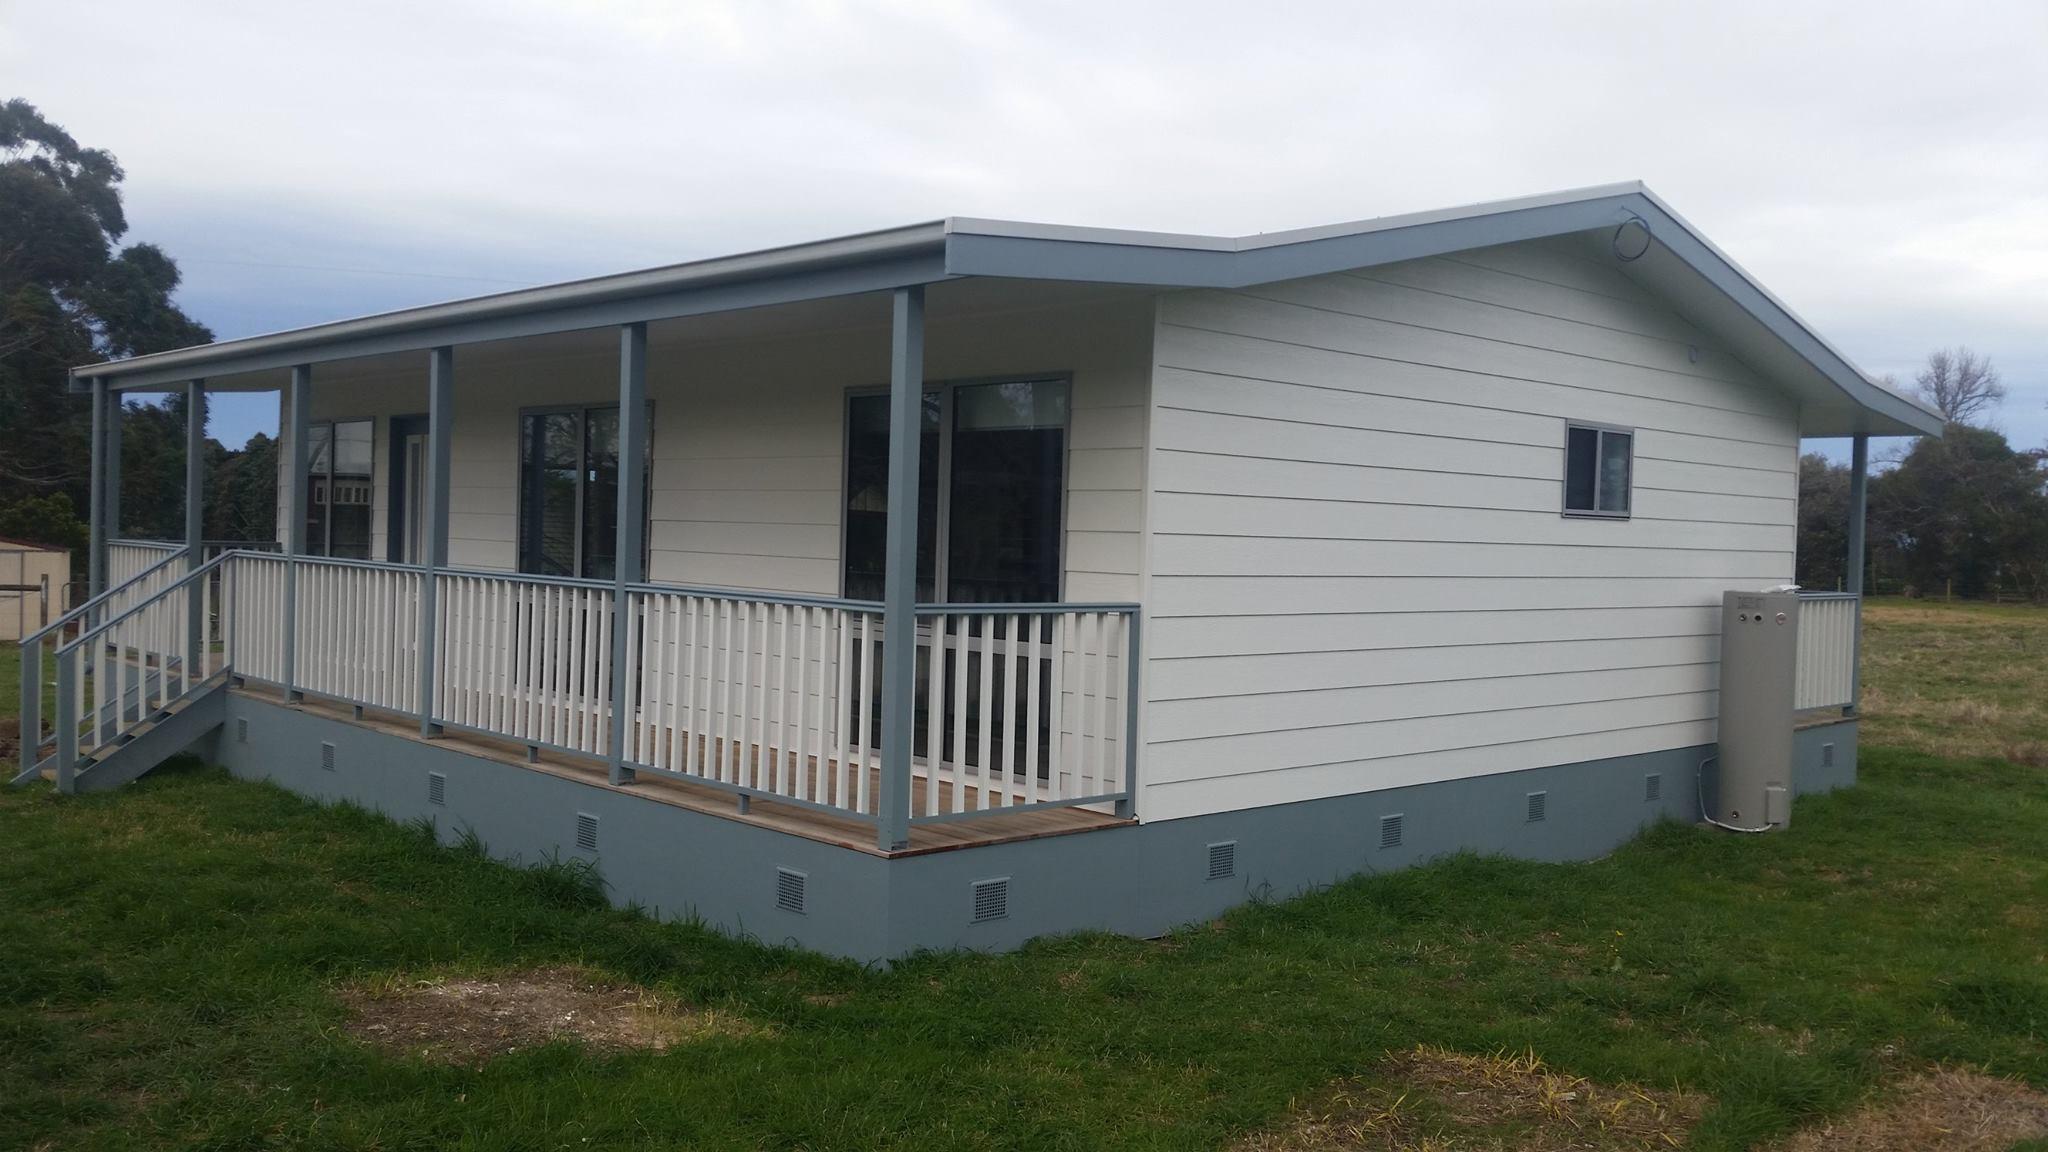 Premier Homes and Granny Flats - New Semi-Rural Granny Flat Victoria, Outside